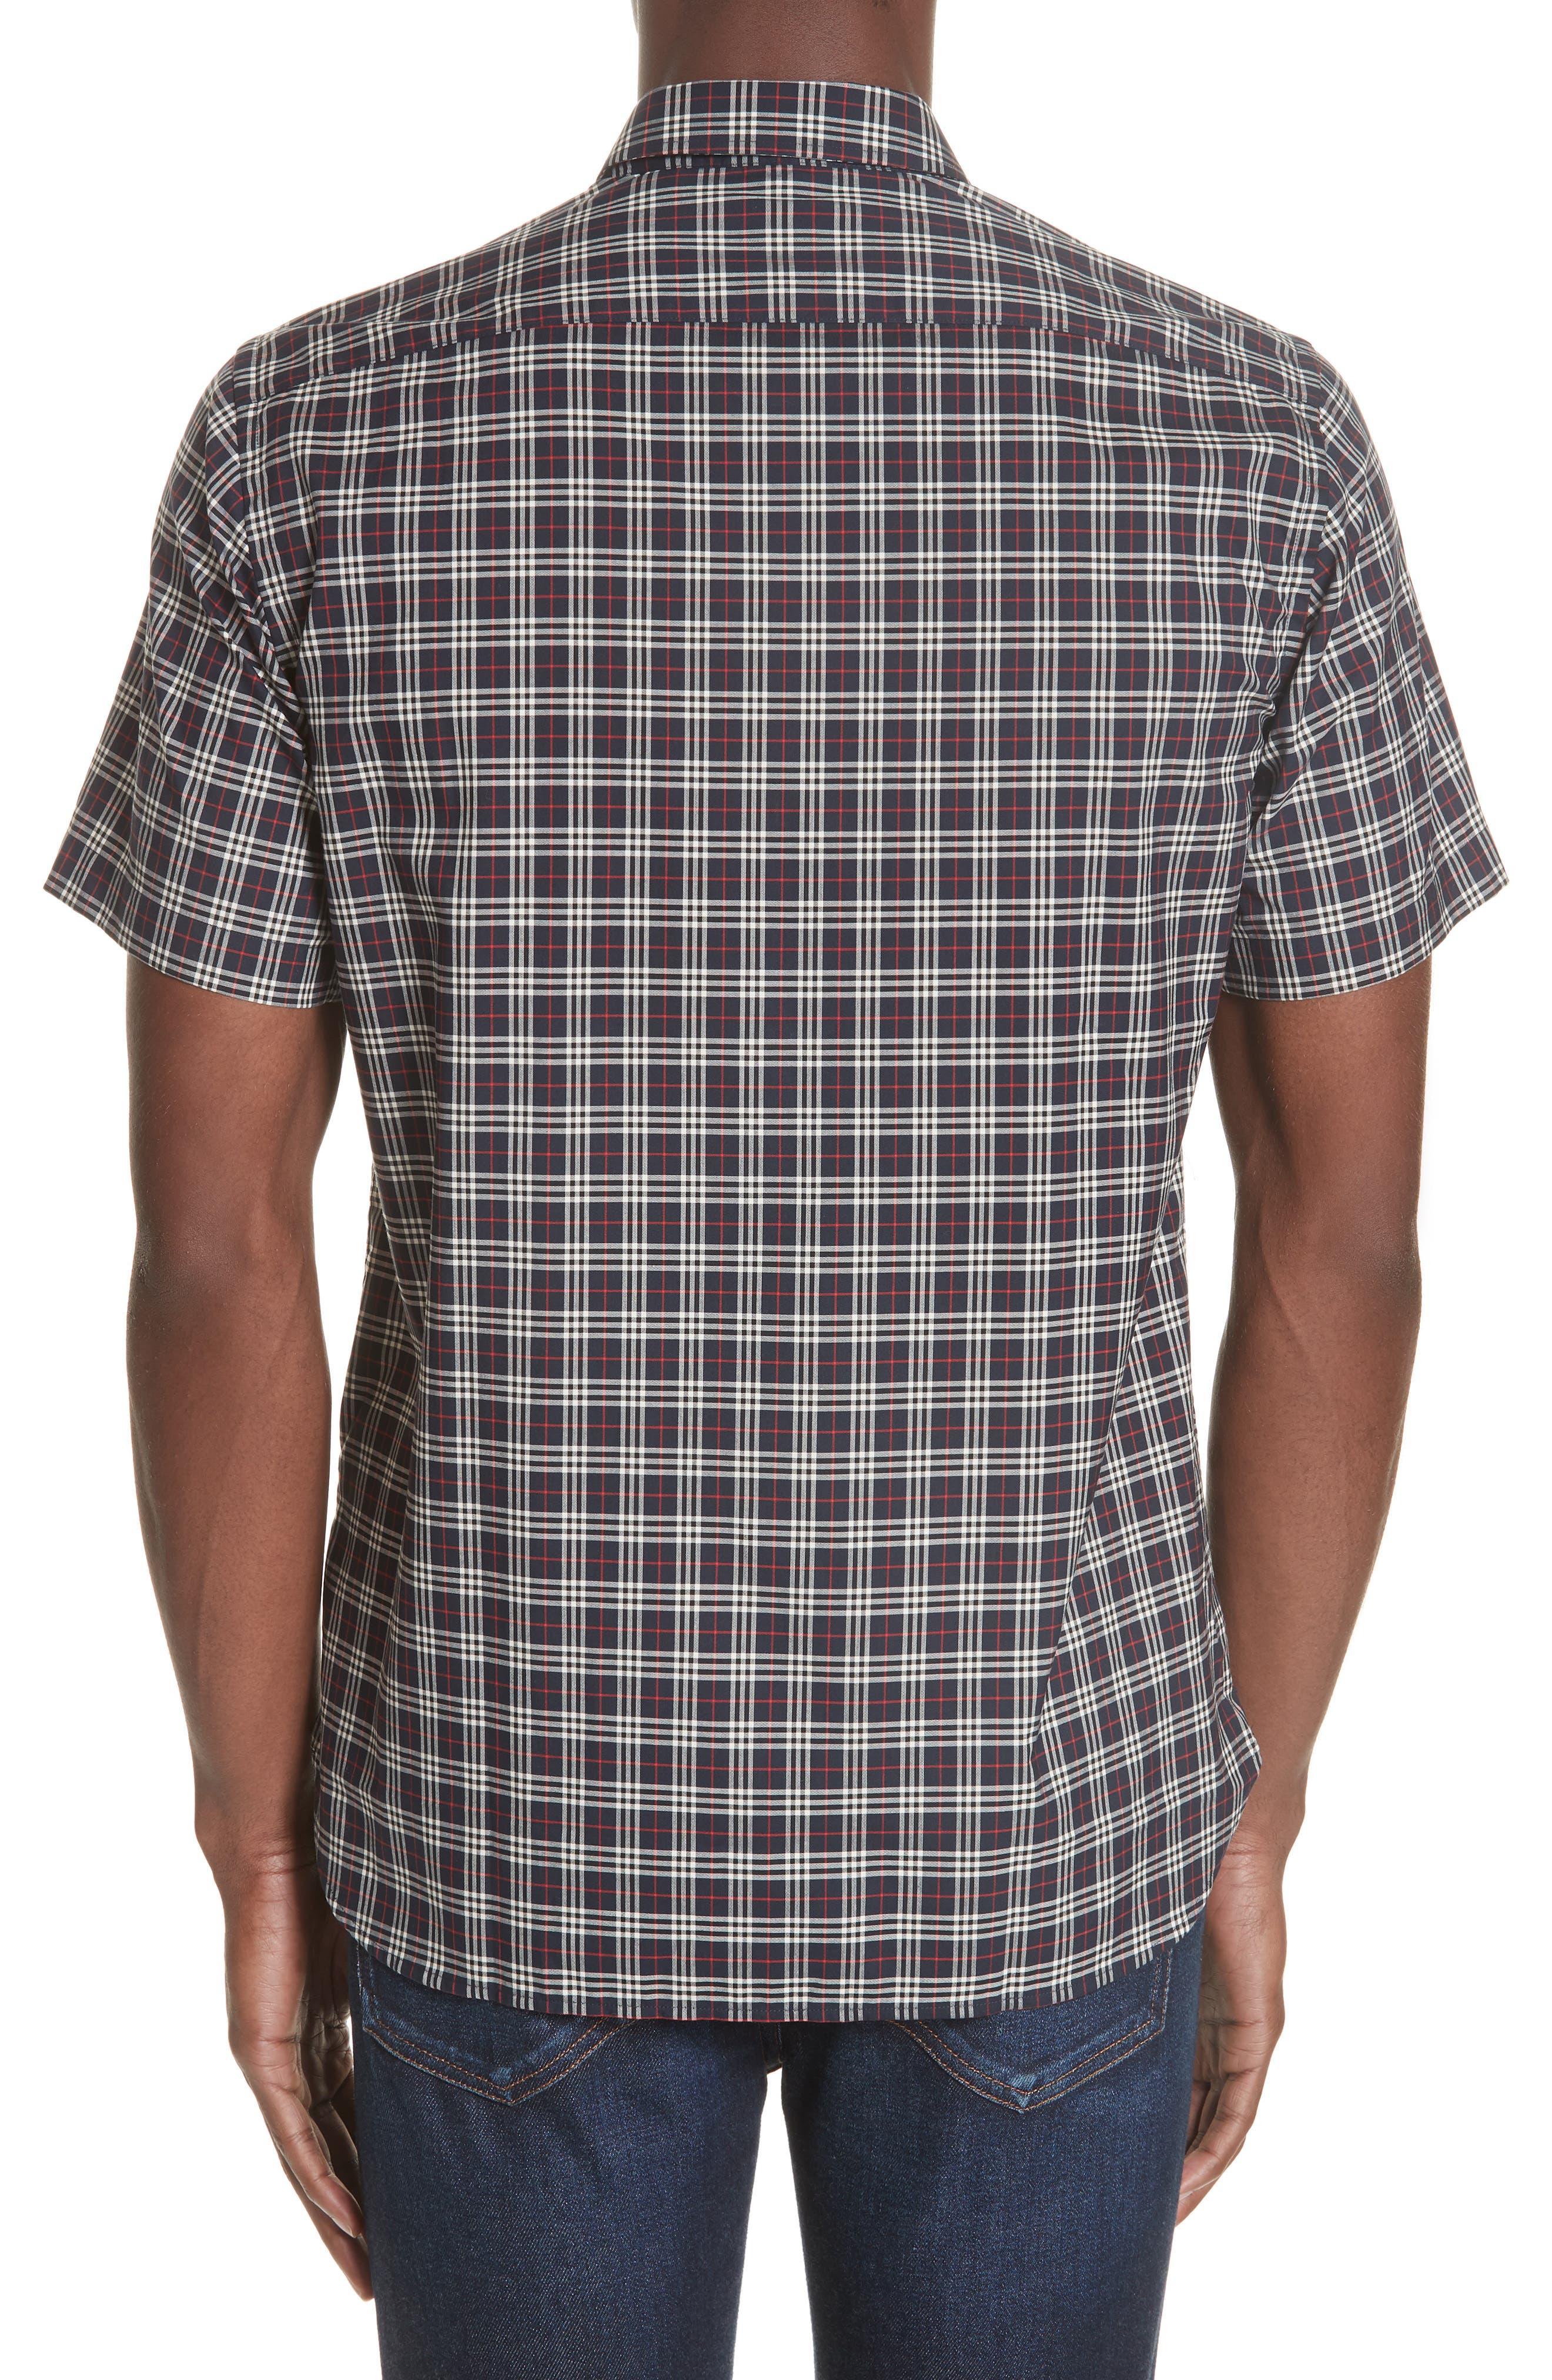 Edward Short Sleeve Shirt,                             Alternate thumbnail 3, color,                             400